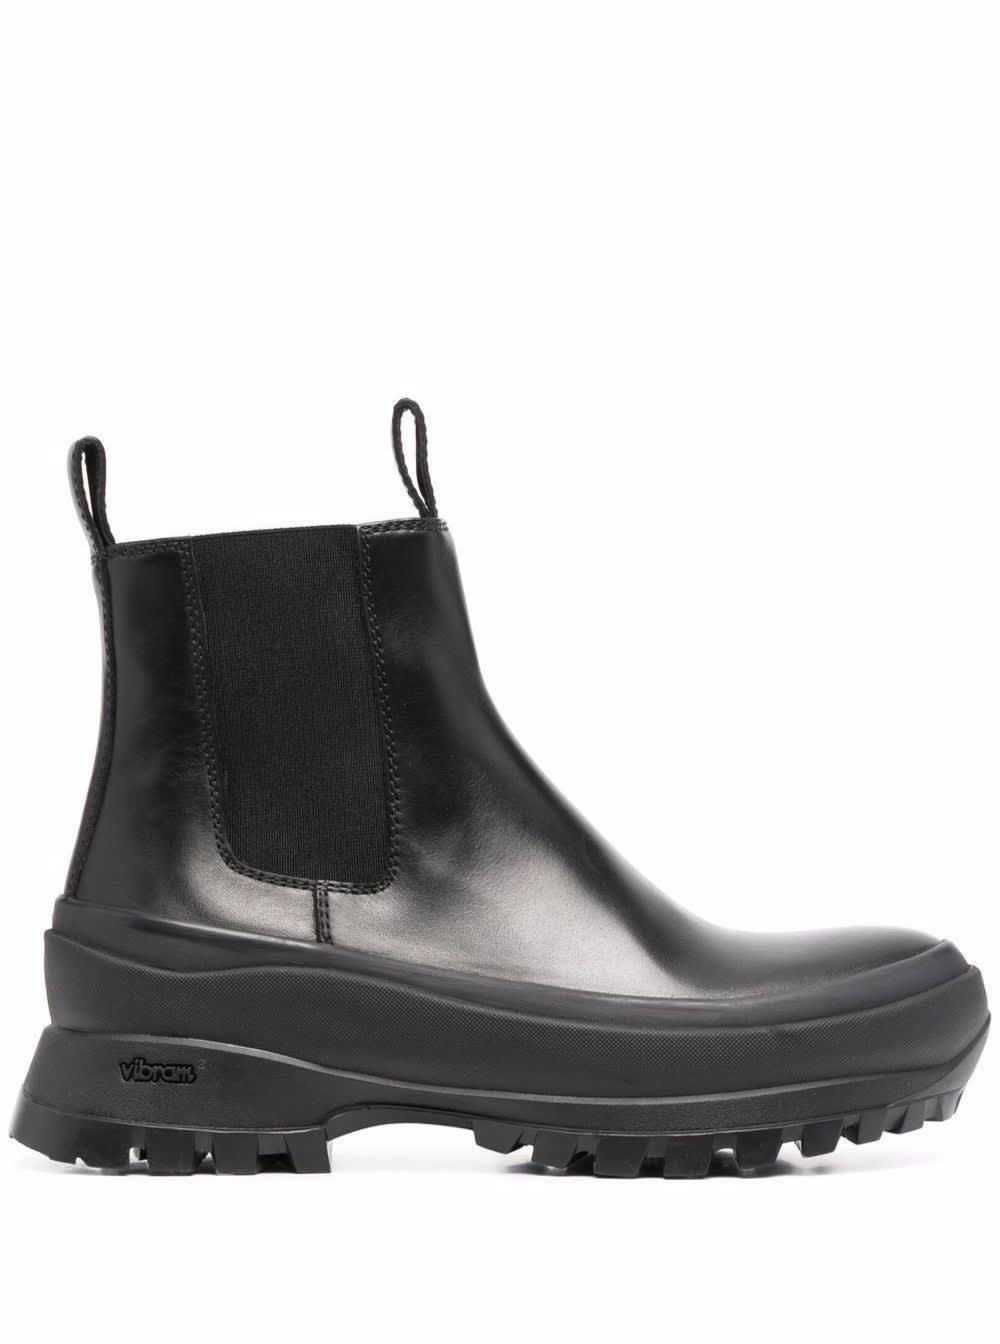 Buy Jil Sander Ankle Boot - Vit. boston 999 online, shop Jil Sander shoes with free shipping